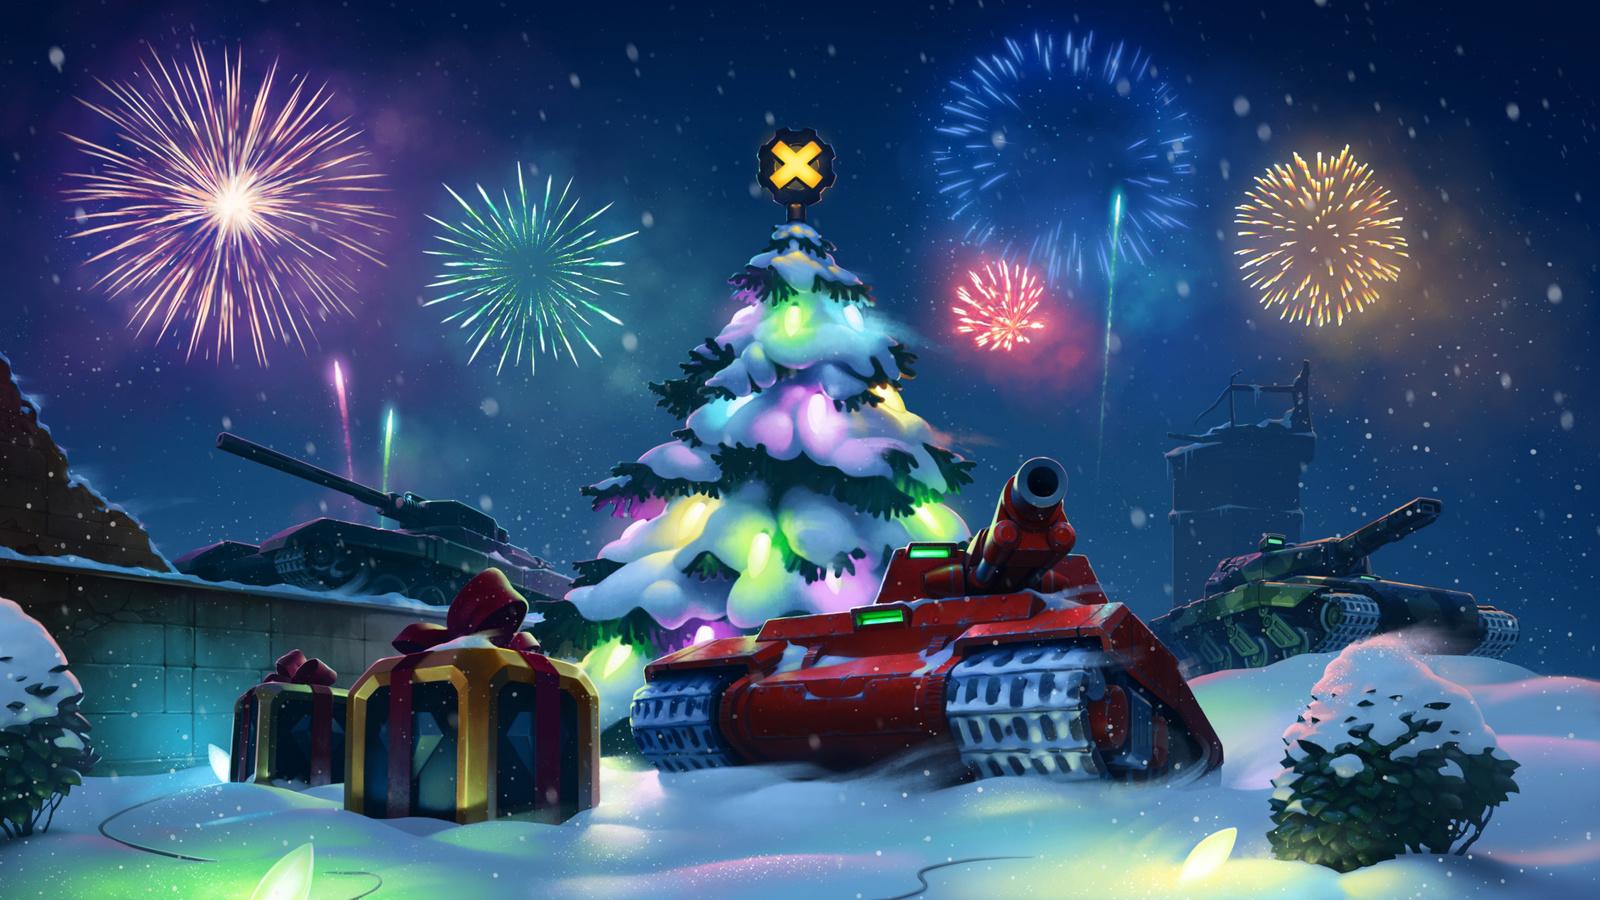 Картинки новогодних онлайн игр